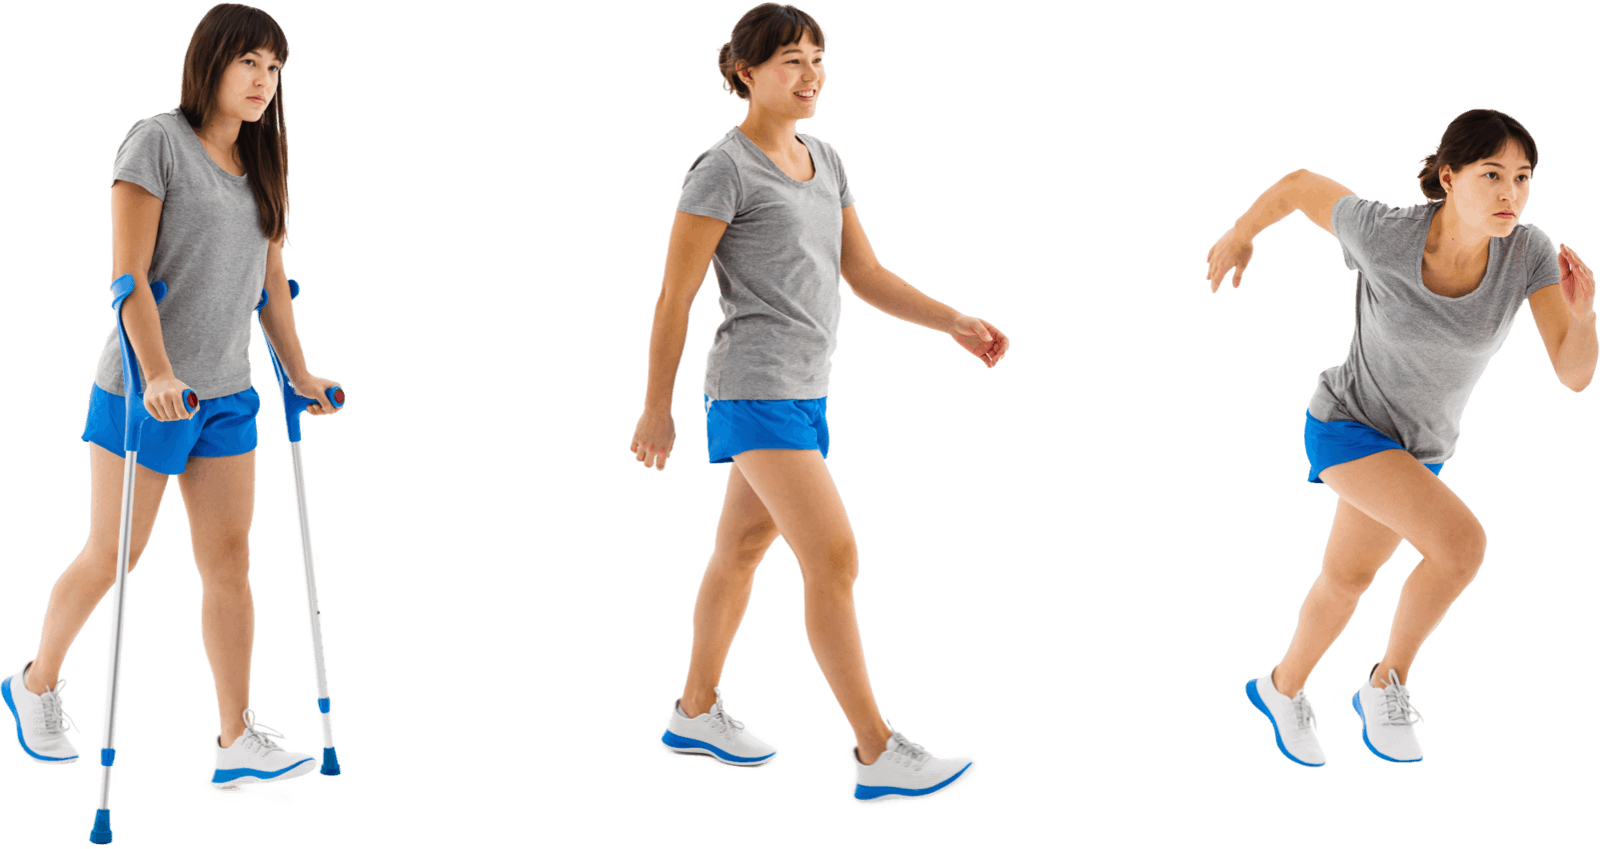 moticon-rego-progression-crutches-walking-sprint